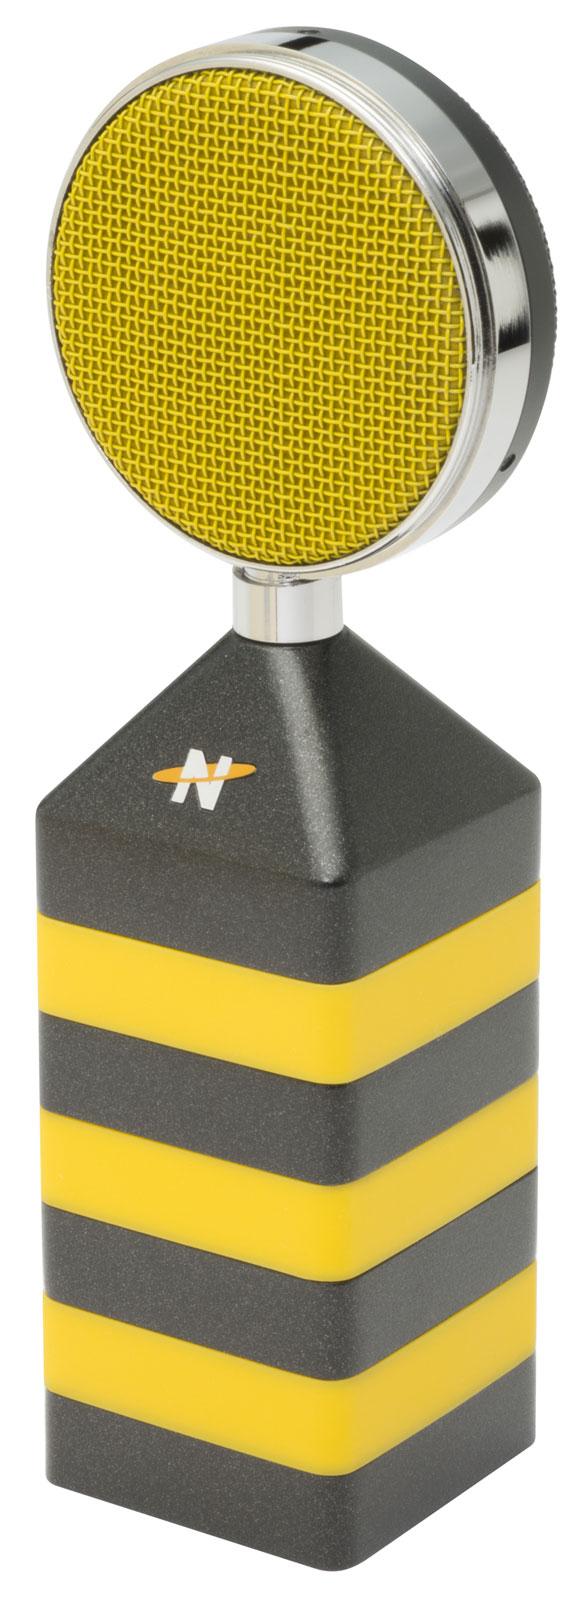 Microphone à condensateur large capsule Neat Kingbee